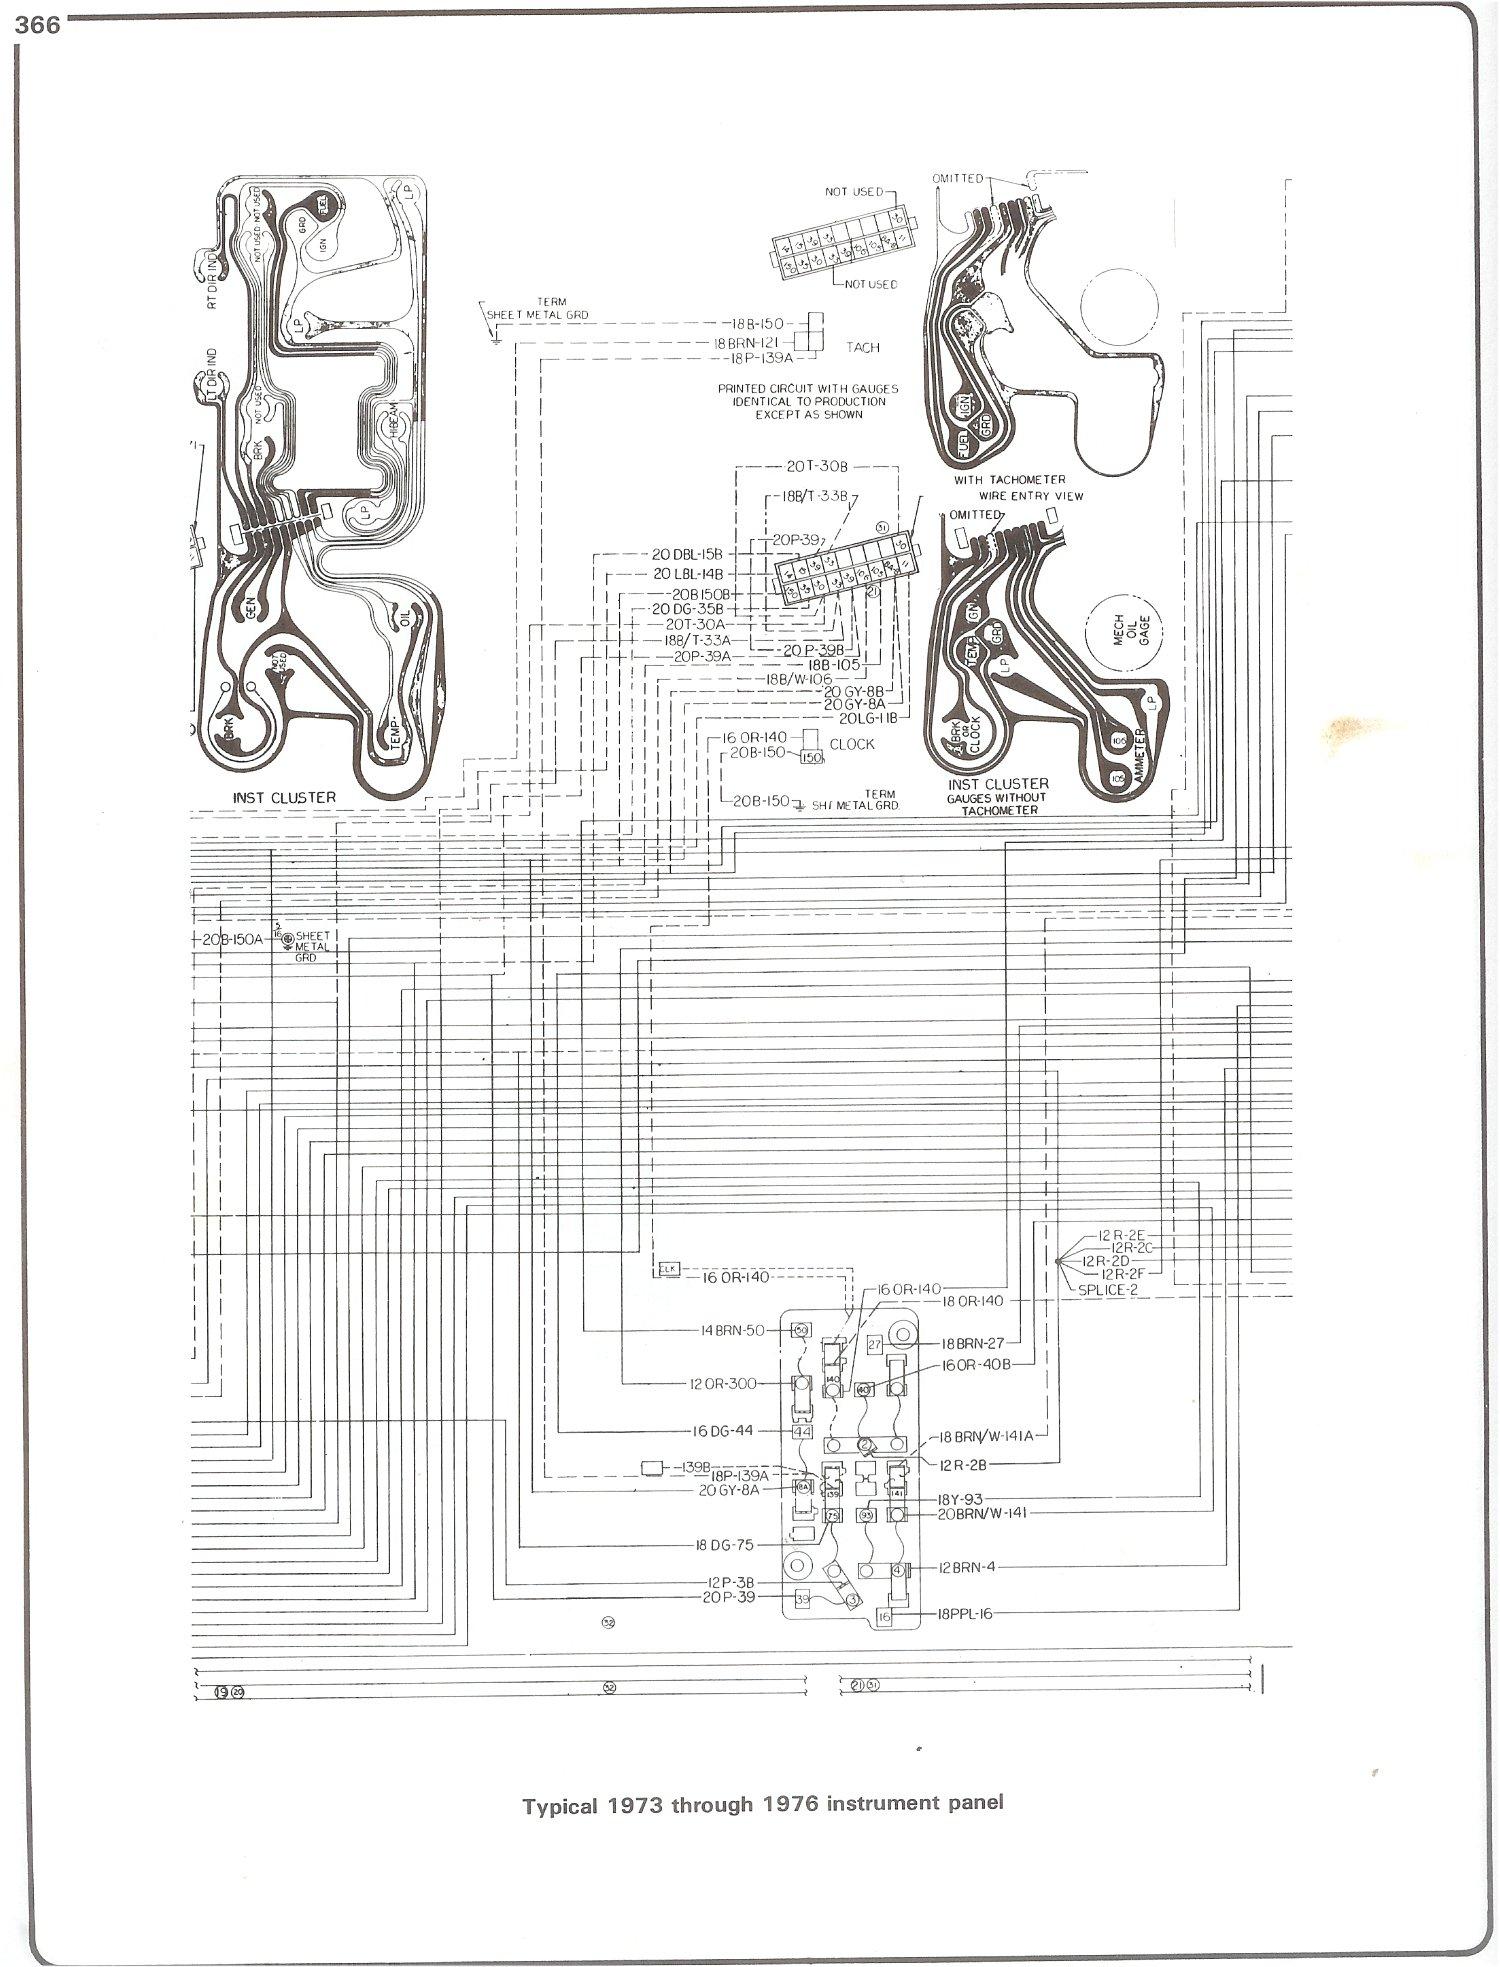 96 Pat Engine Diagram Engine Anatomy Wiring Diagram Odicis